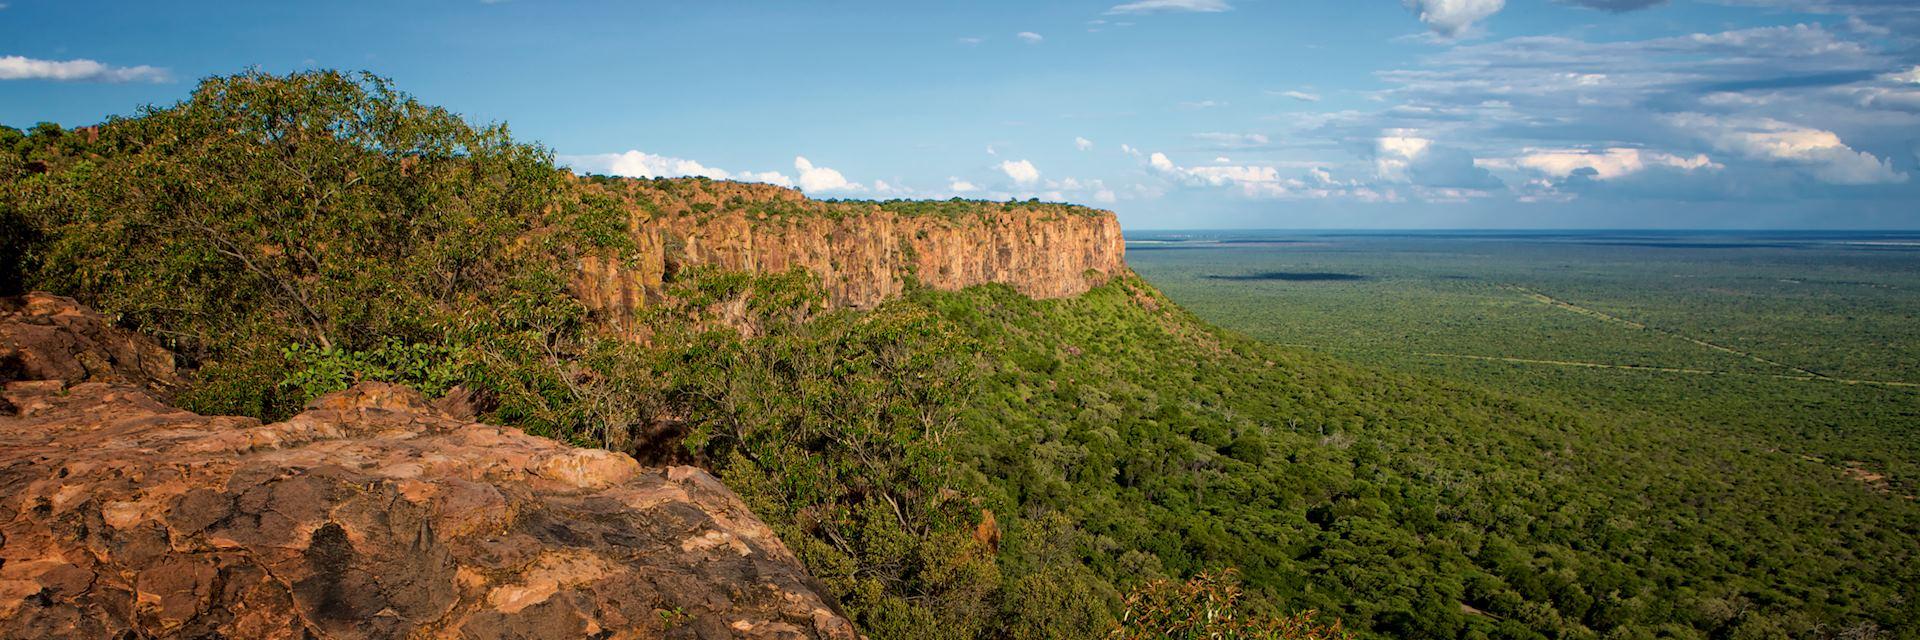 Namibia's Central Highlands